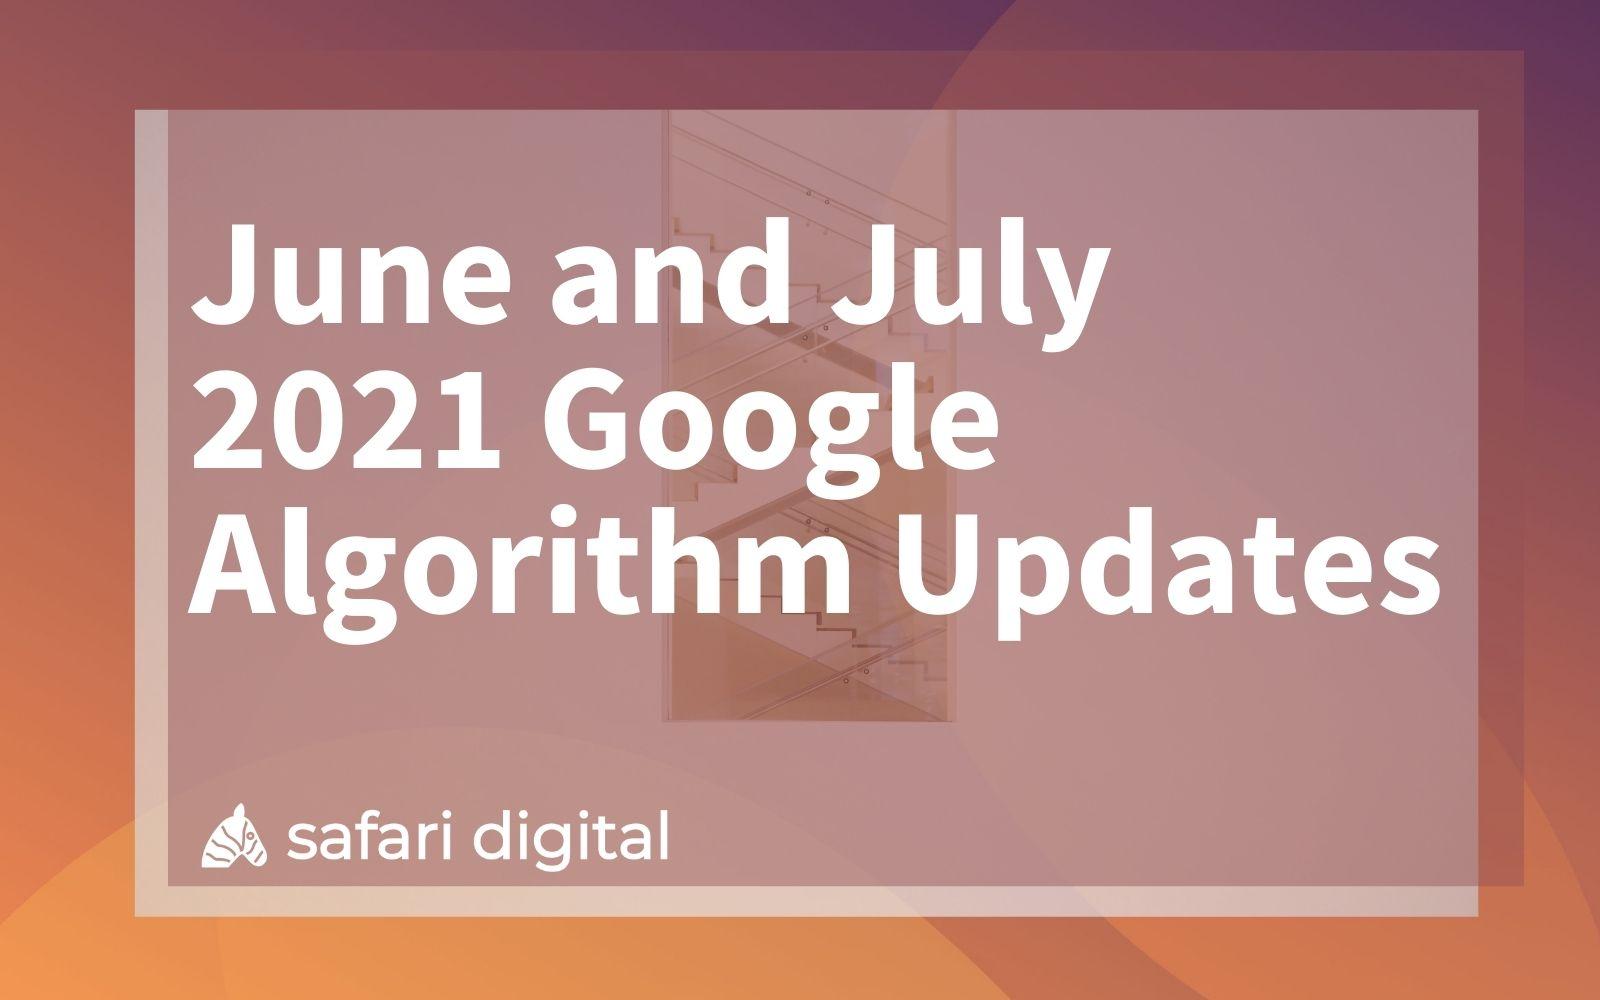 June 2021 and July 2021 Google Algorithm Updates